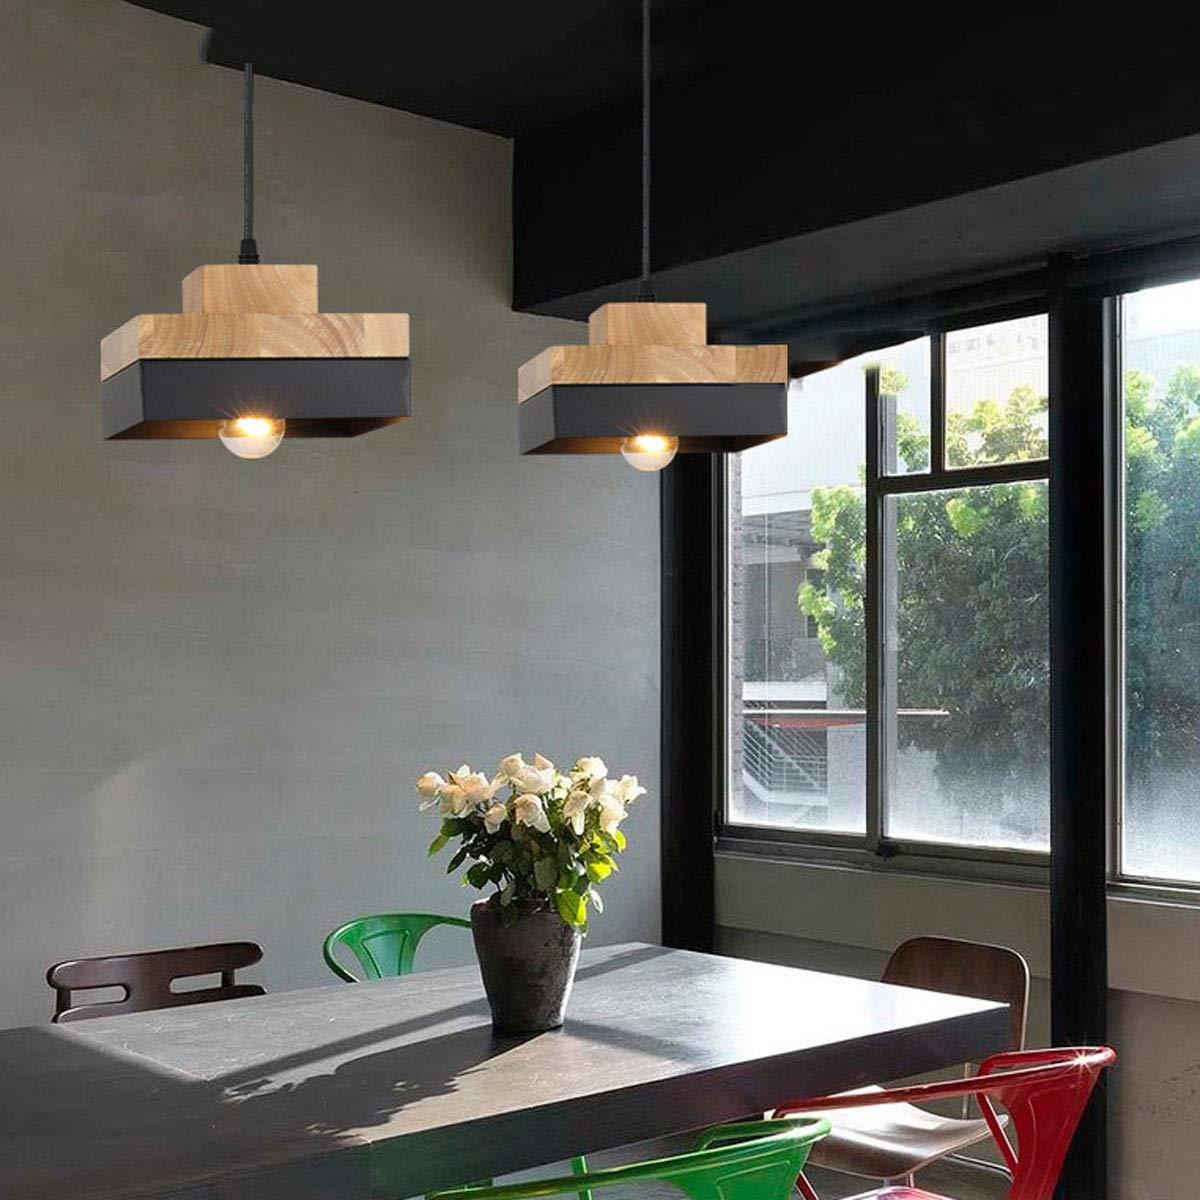 Y Sencillas Restaurantes Araña Luces Pequeña Modernas Para Lctcdd bfYy6g7